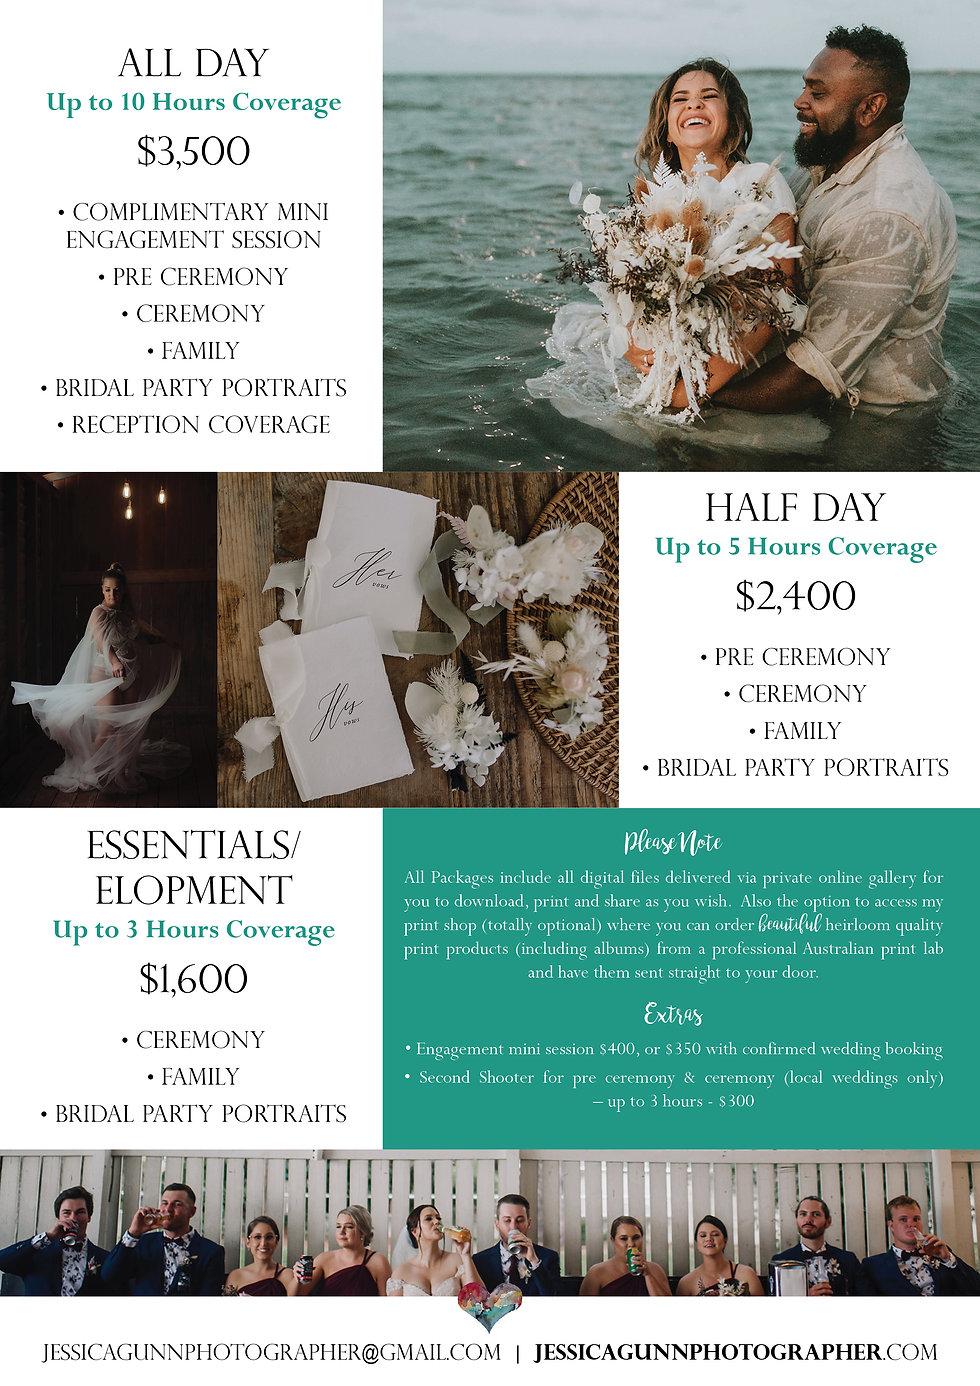 JGP Wedding Package Pricing Guide 21-222